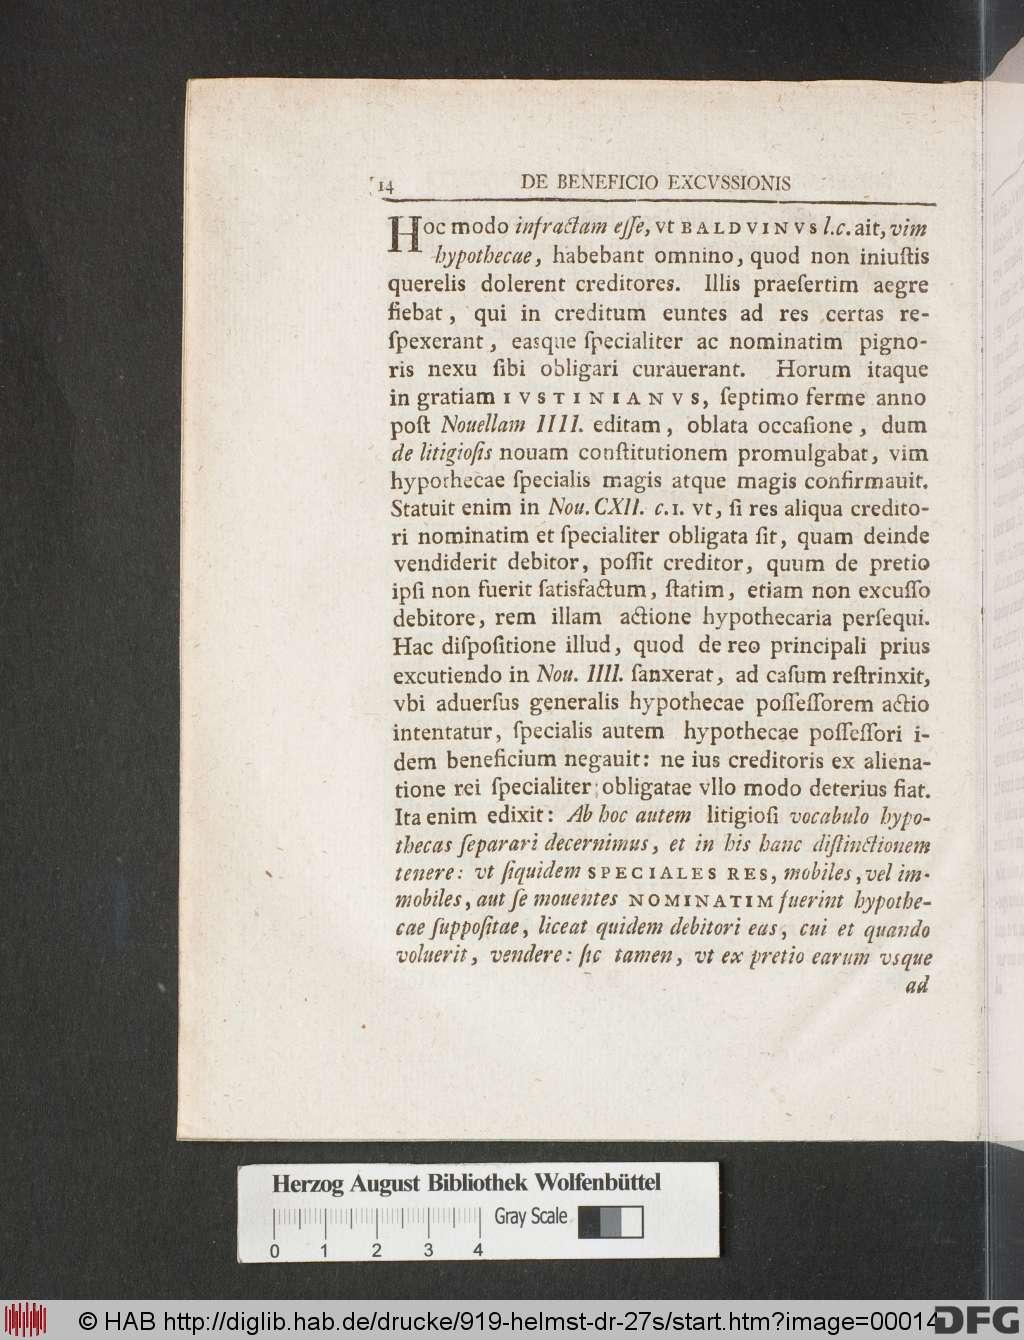 https://diglib.hab.de/drucke/919-helmst-dr-27s/00014.jpg